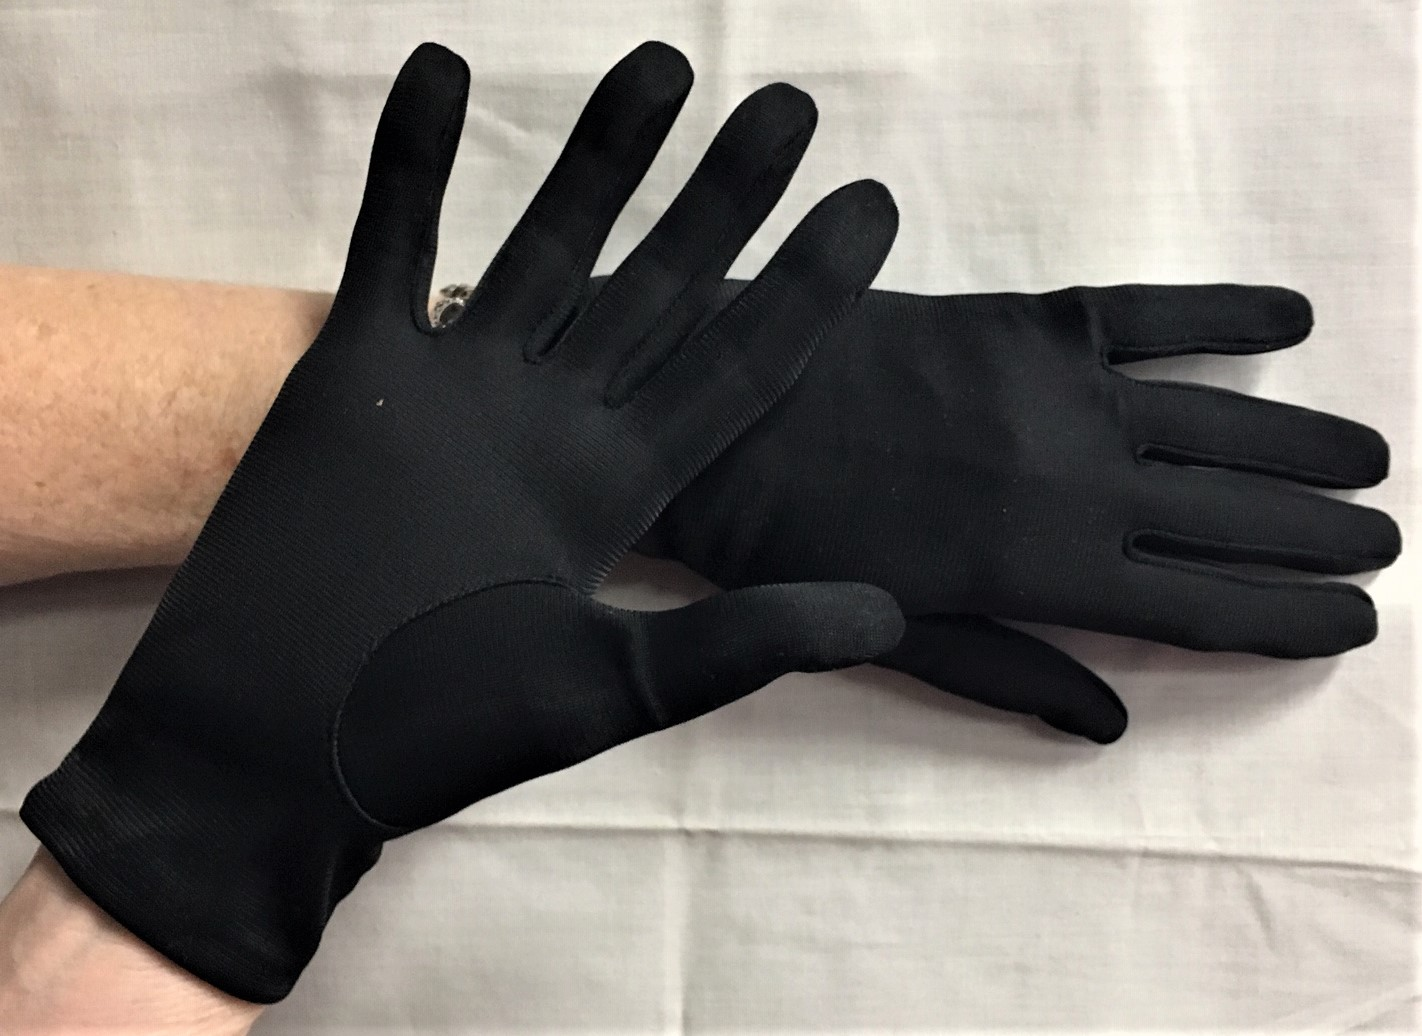 Barry's Children's Large Nylon Wrist Glove